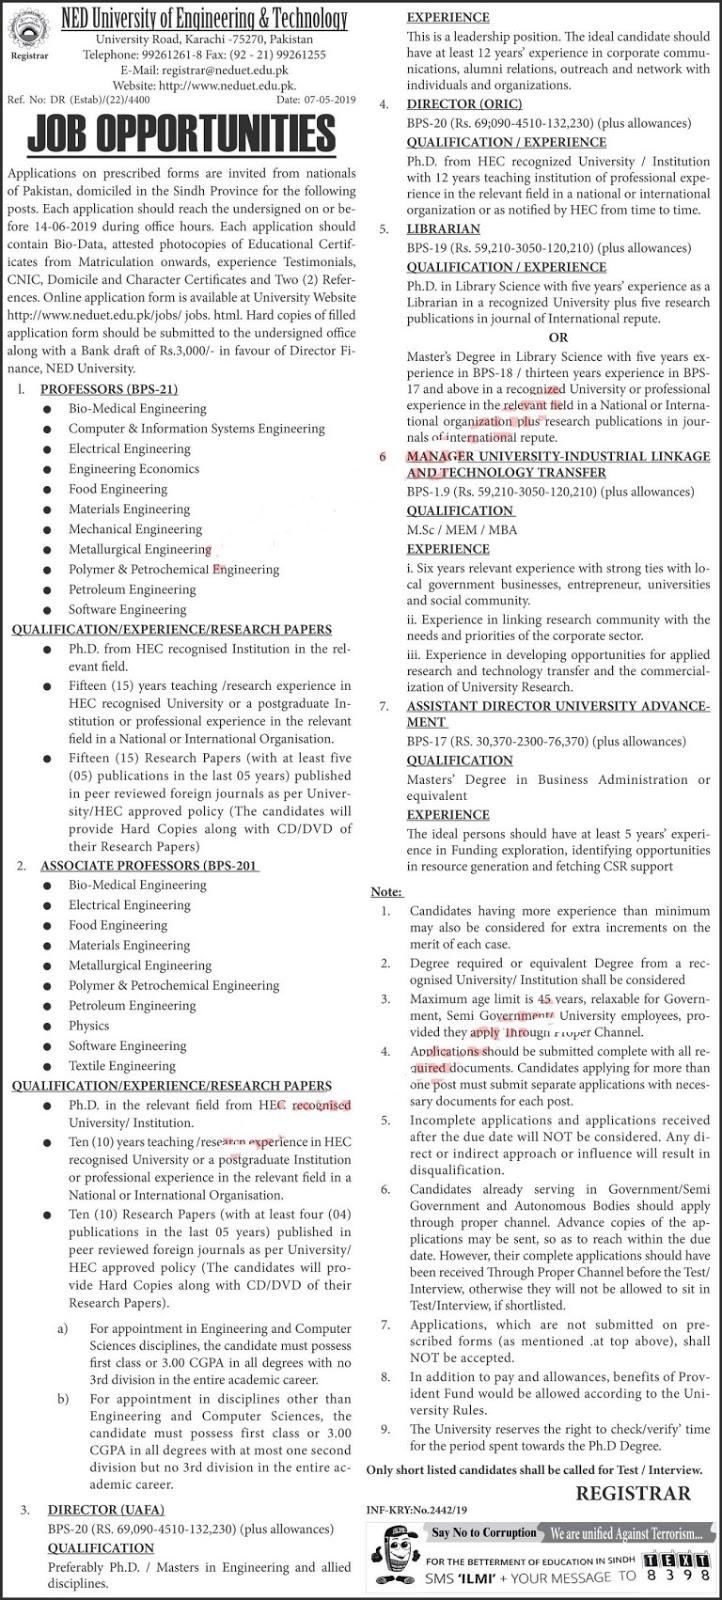 Jobs in NED University of Engineering & Technology Karachi for